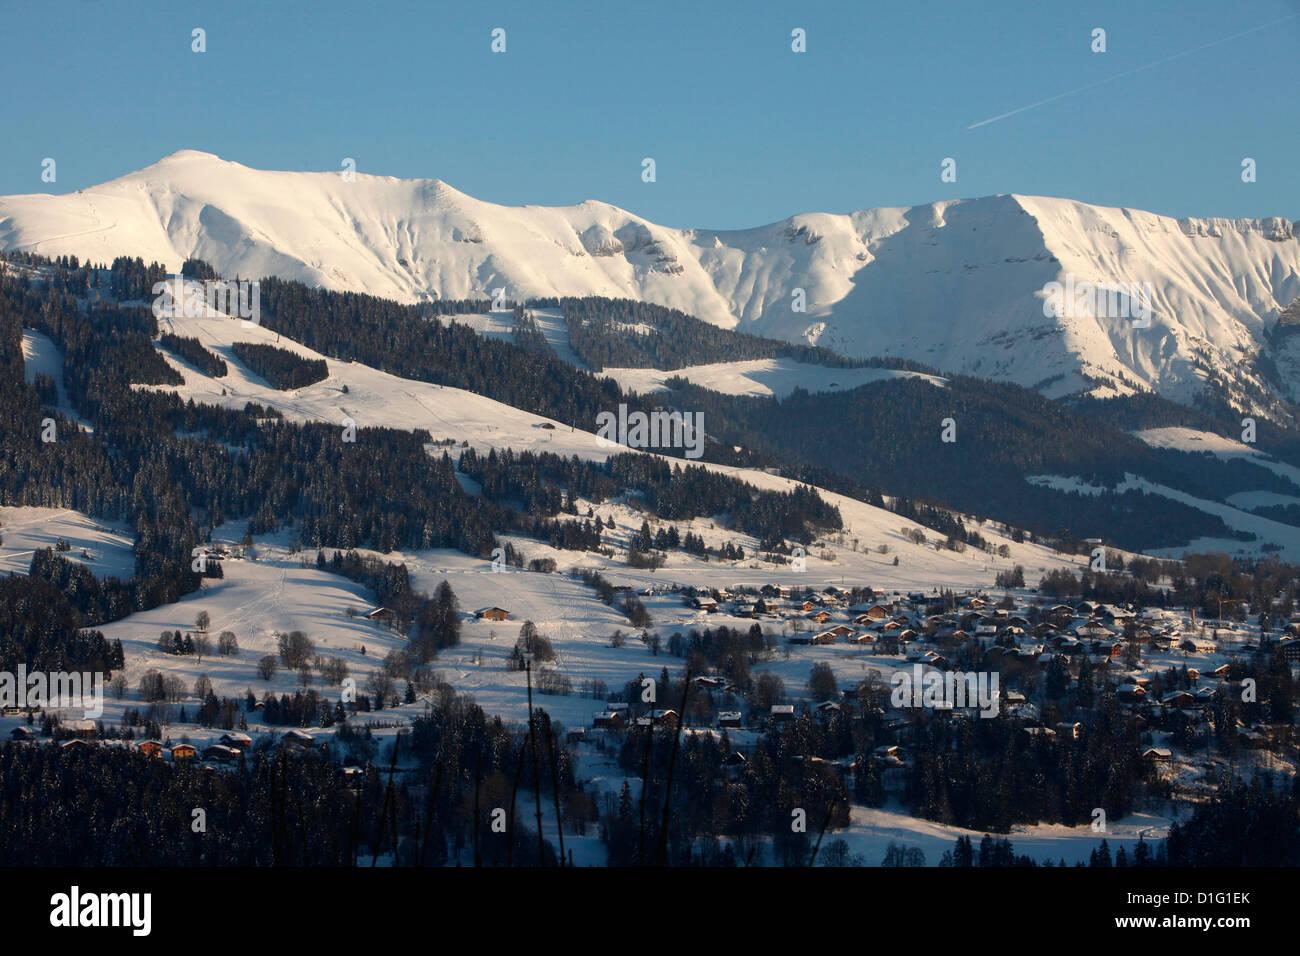 Mont Blanc mountain range, Mont d'Arbois in Megeve, Haute-Savoie, French Alps, France, Europe - Stock Image